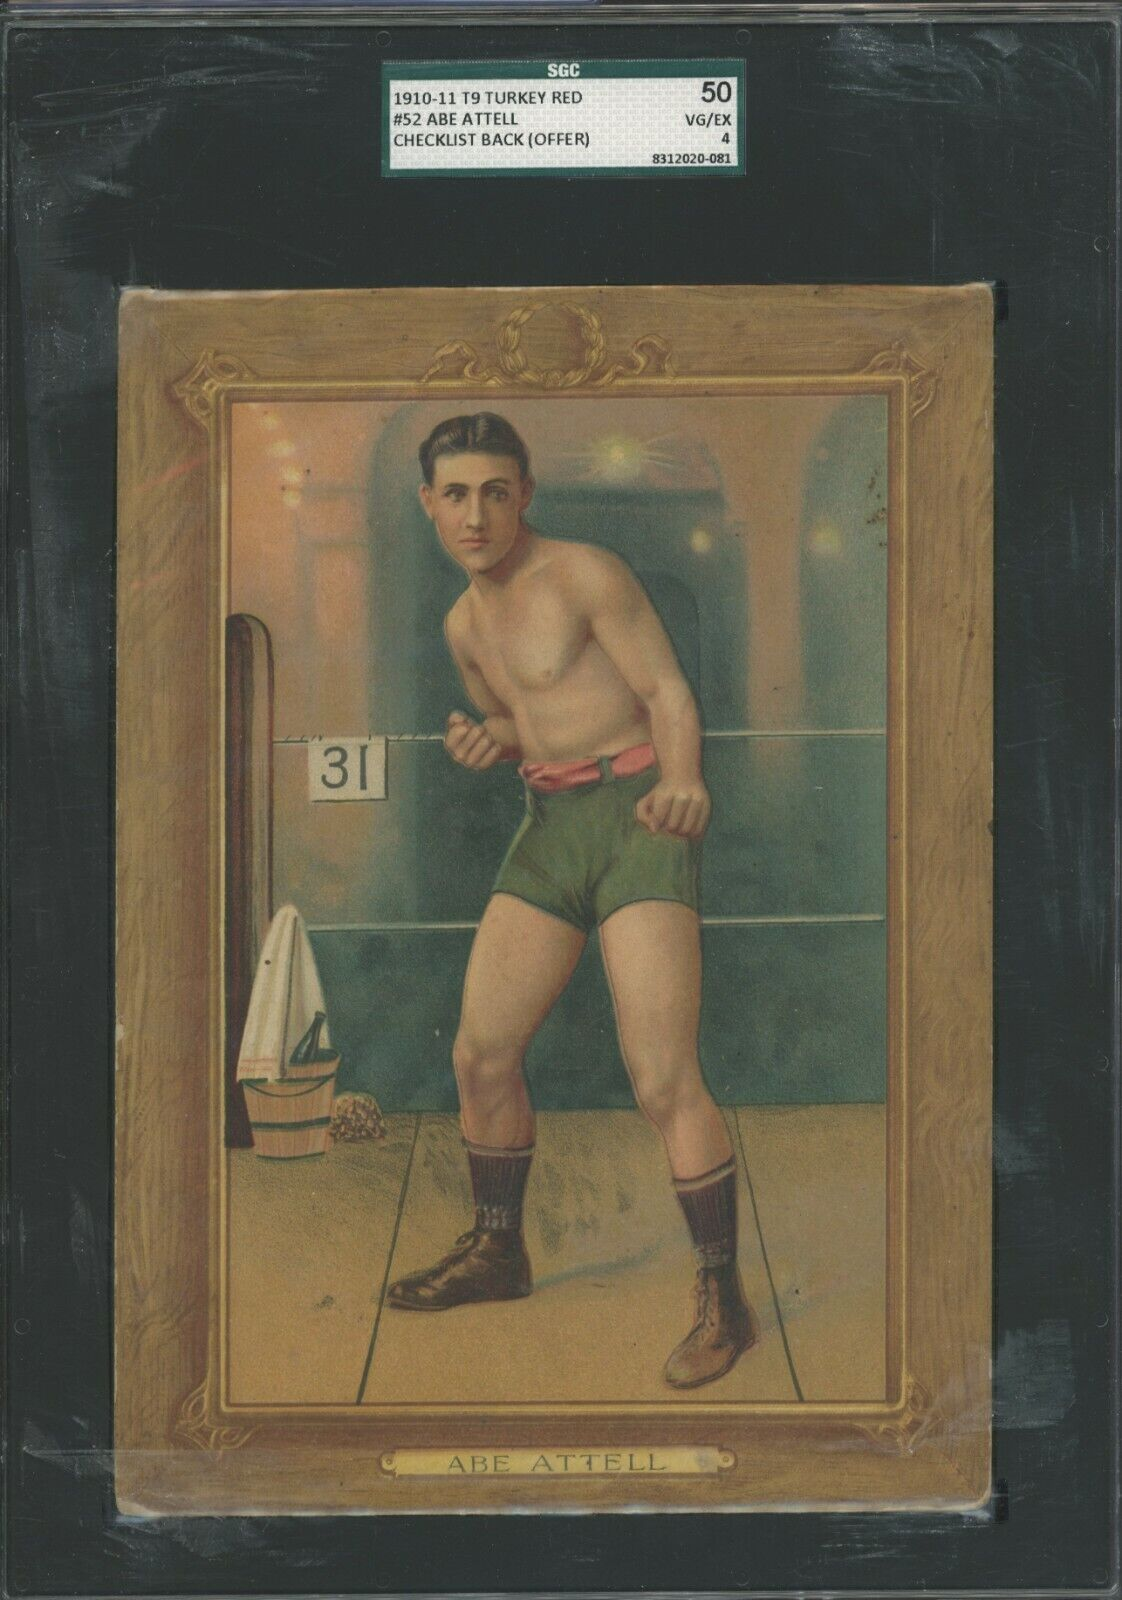 1911 t9 turkey red boxing #52 abe attell checklist back offer sgc 54 vg-ex 4